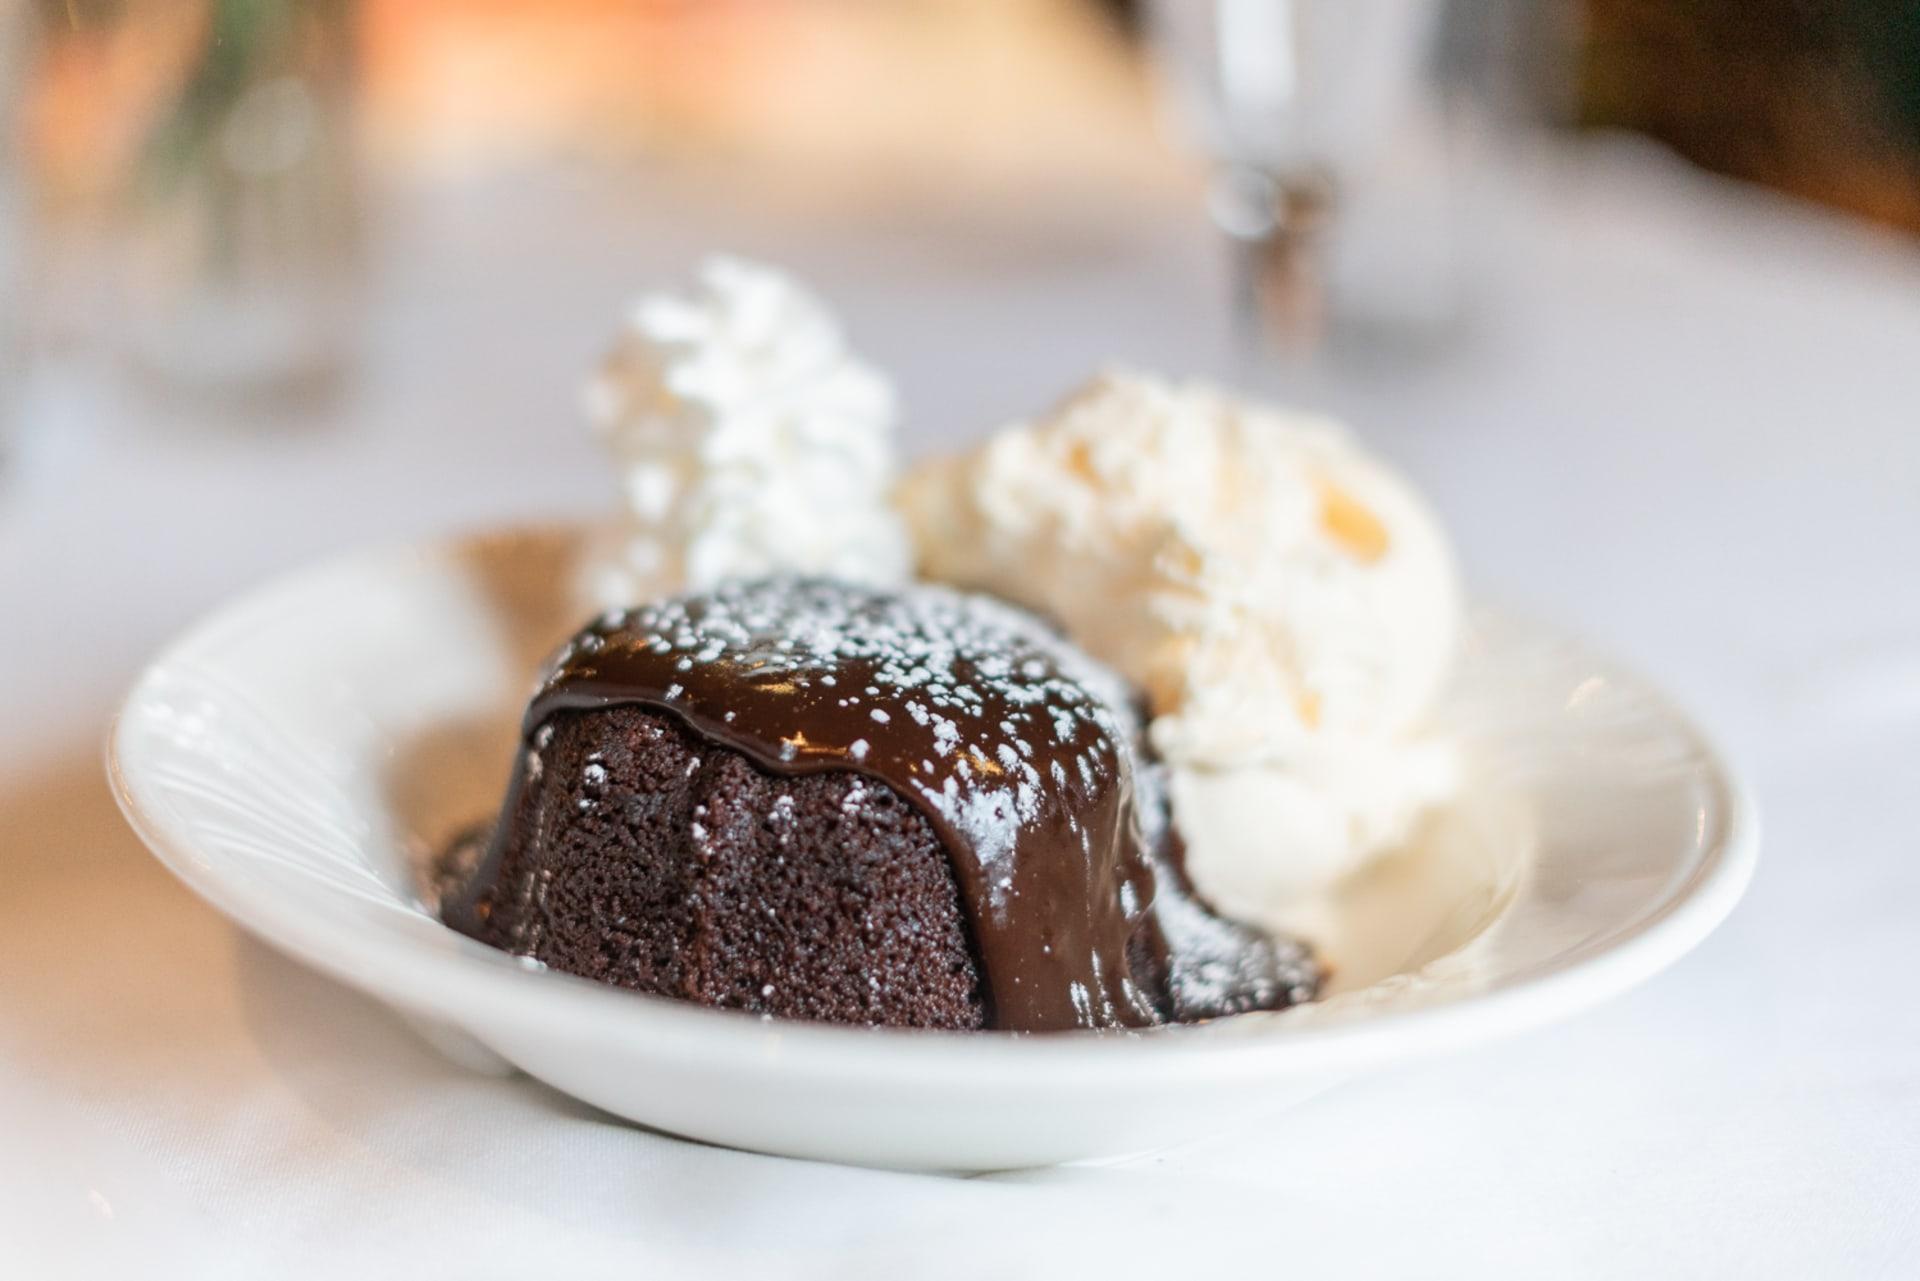 Chocolate on Chocolate Big Baby Bundt Cake